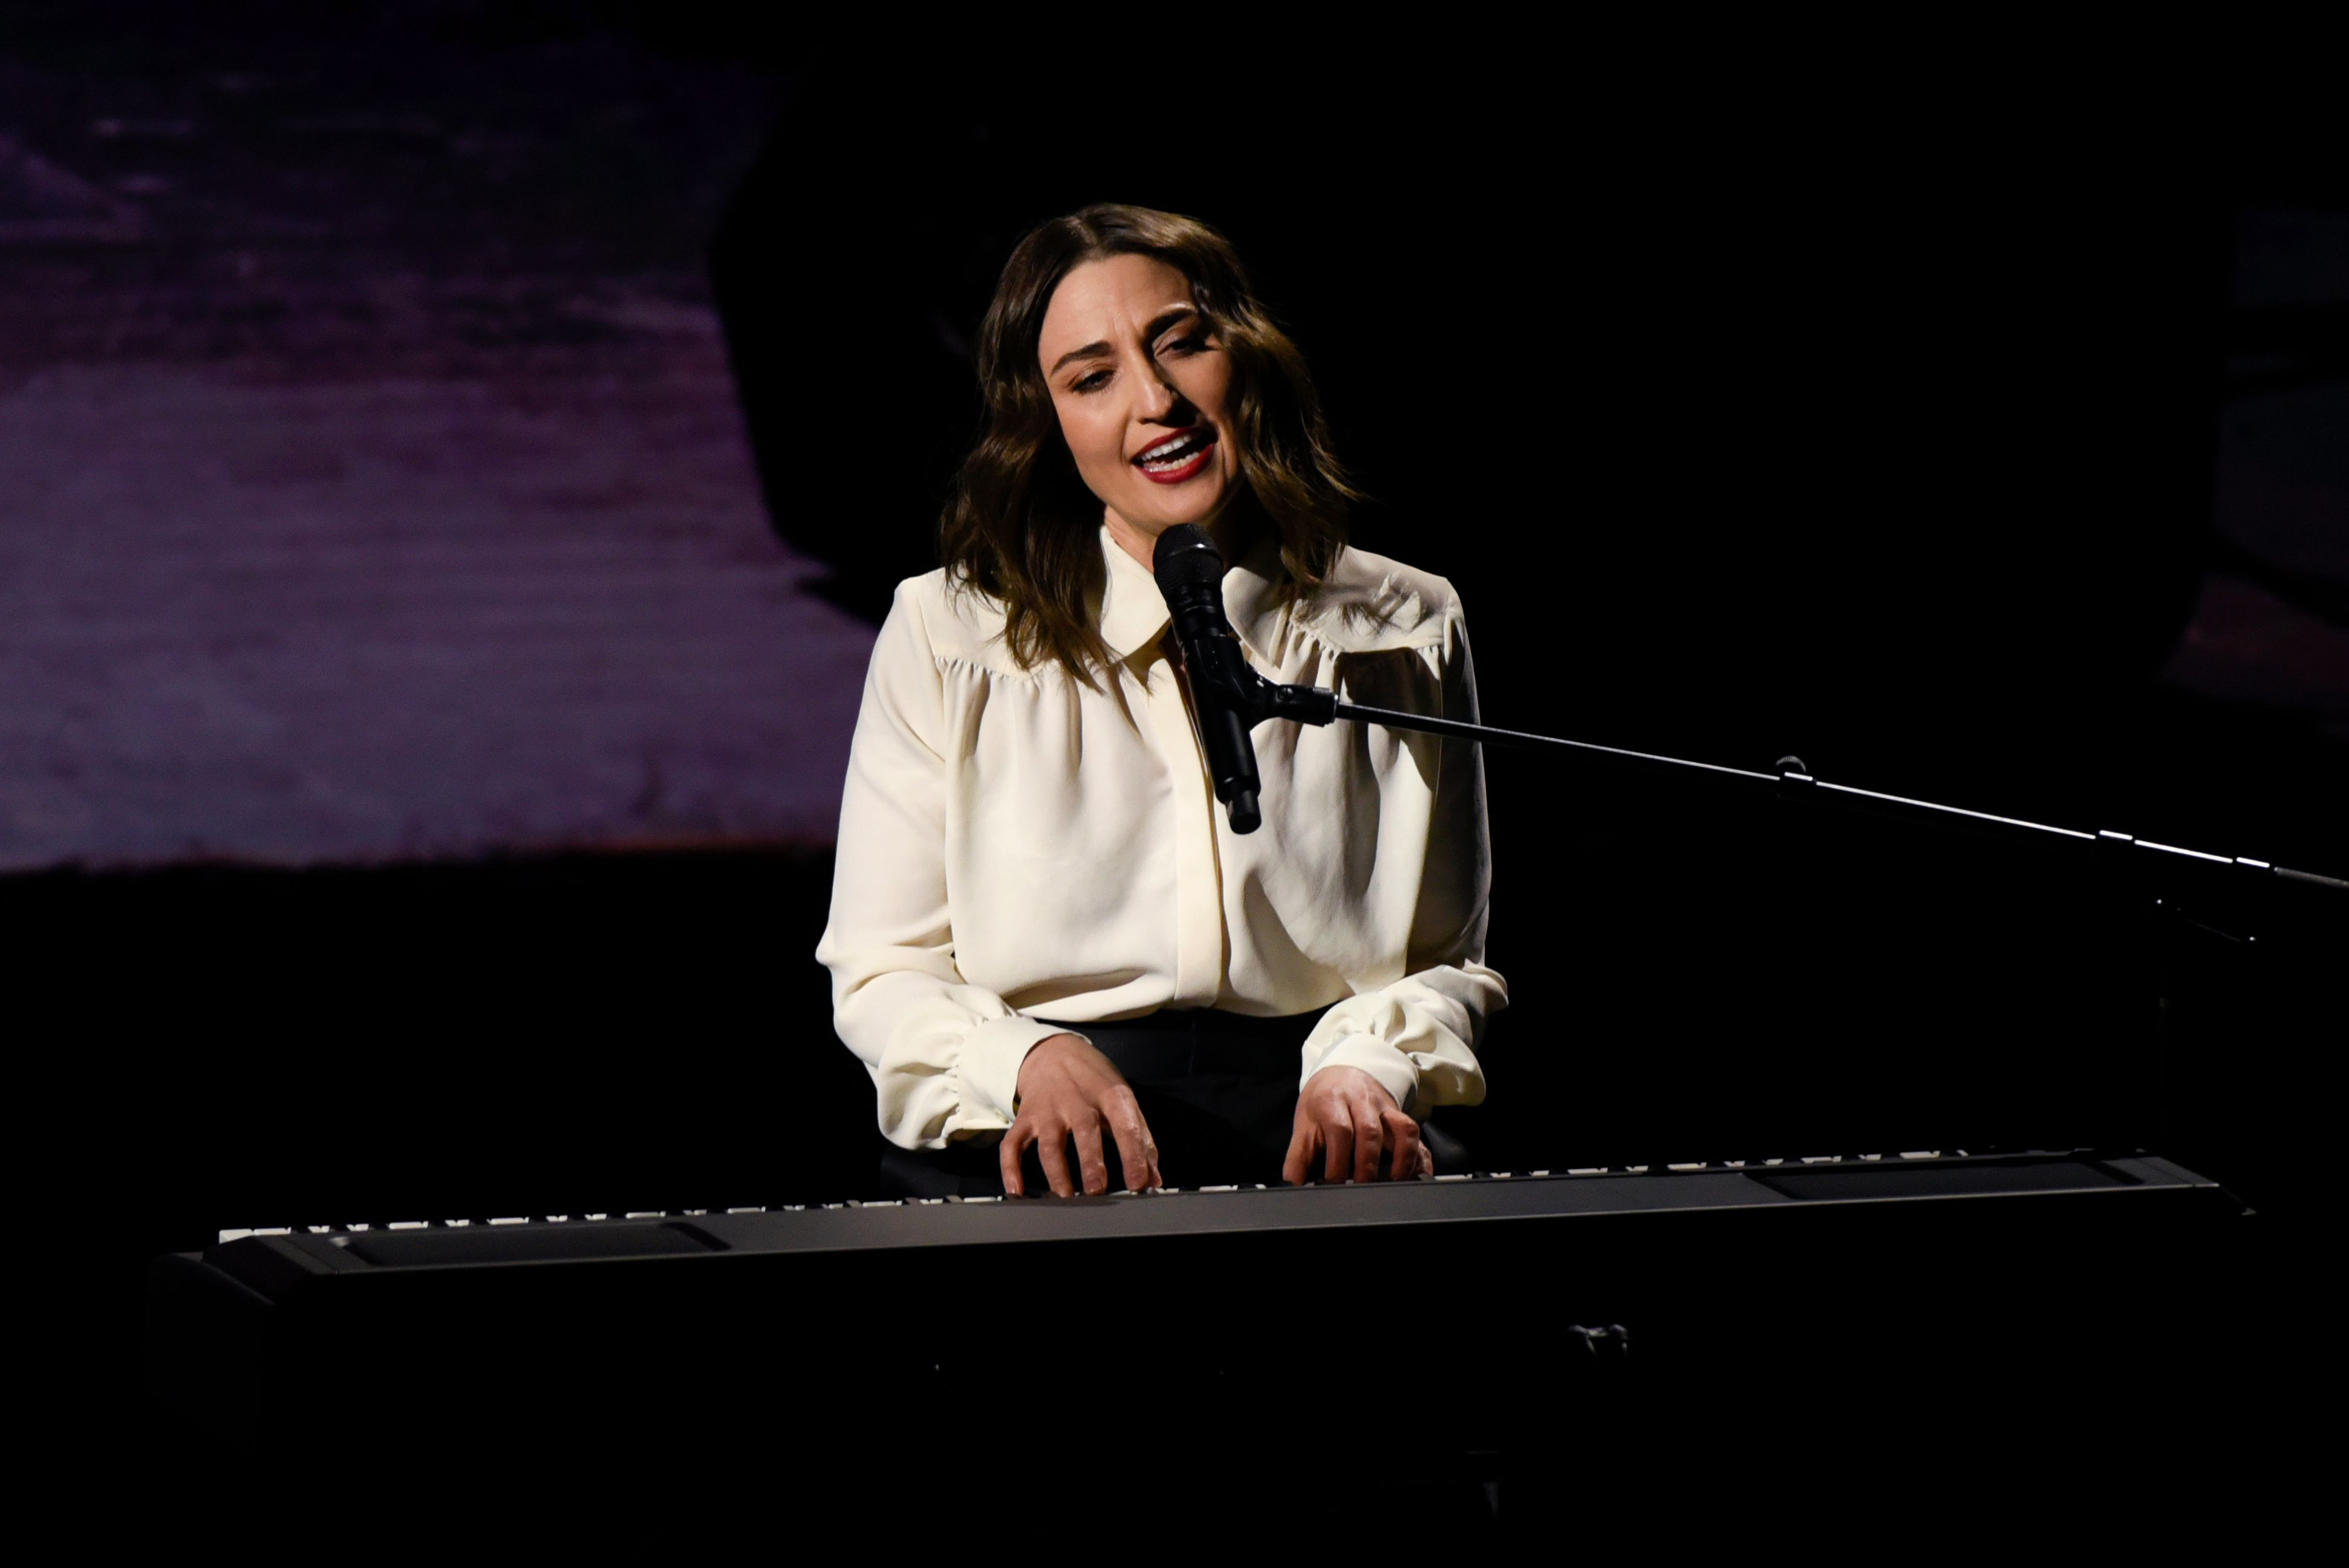 Sara Bareilles performing on stage